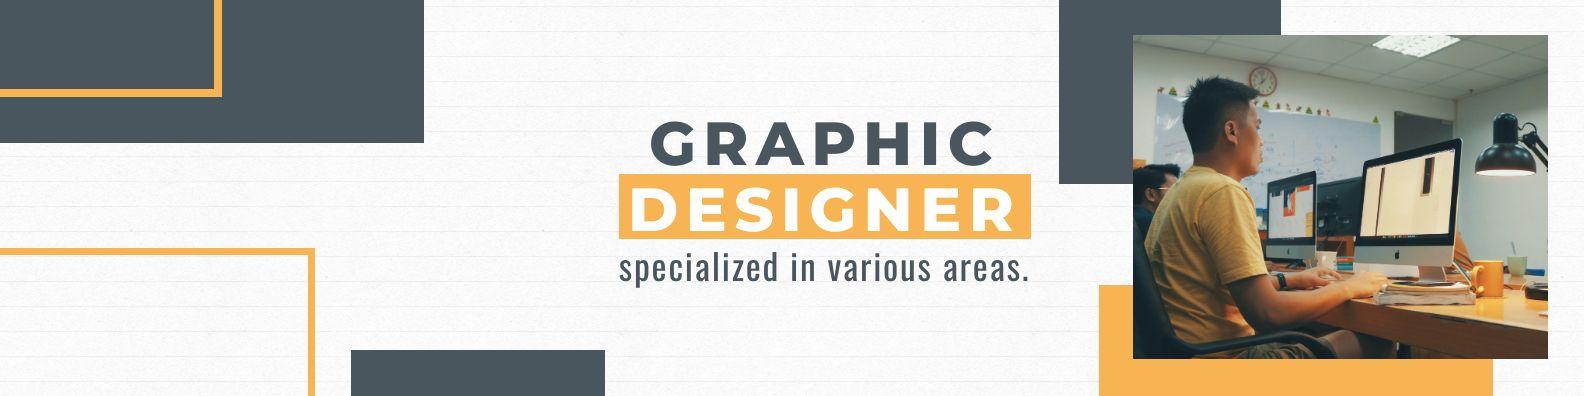 linkedin cover photo graphic designer